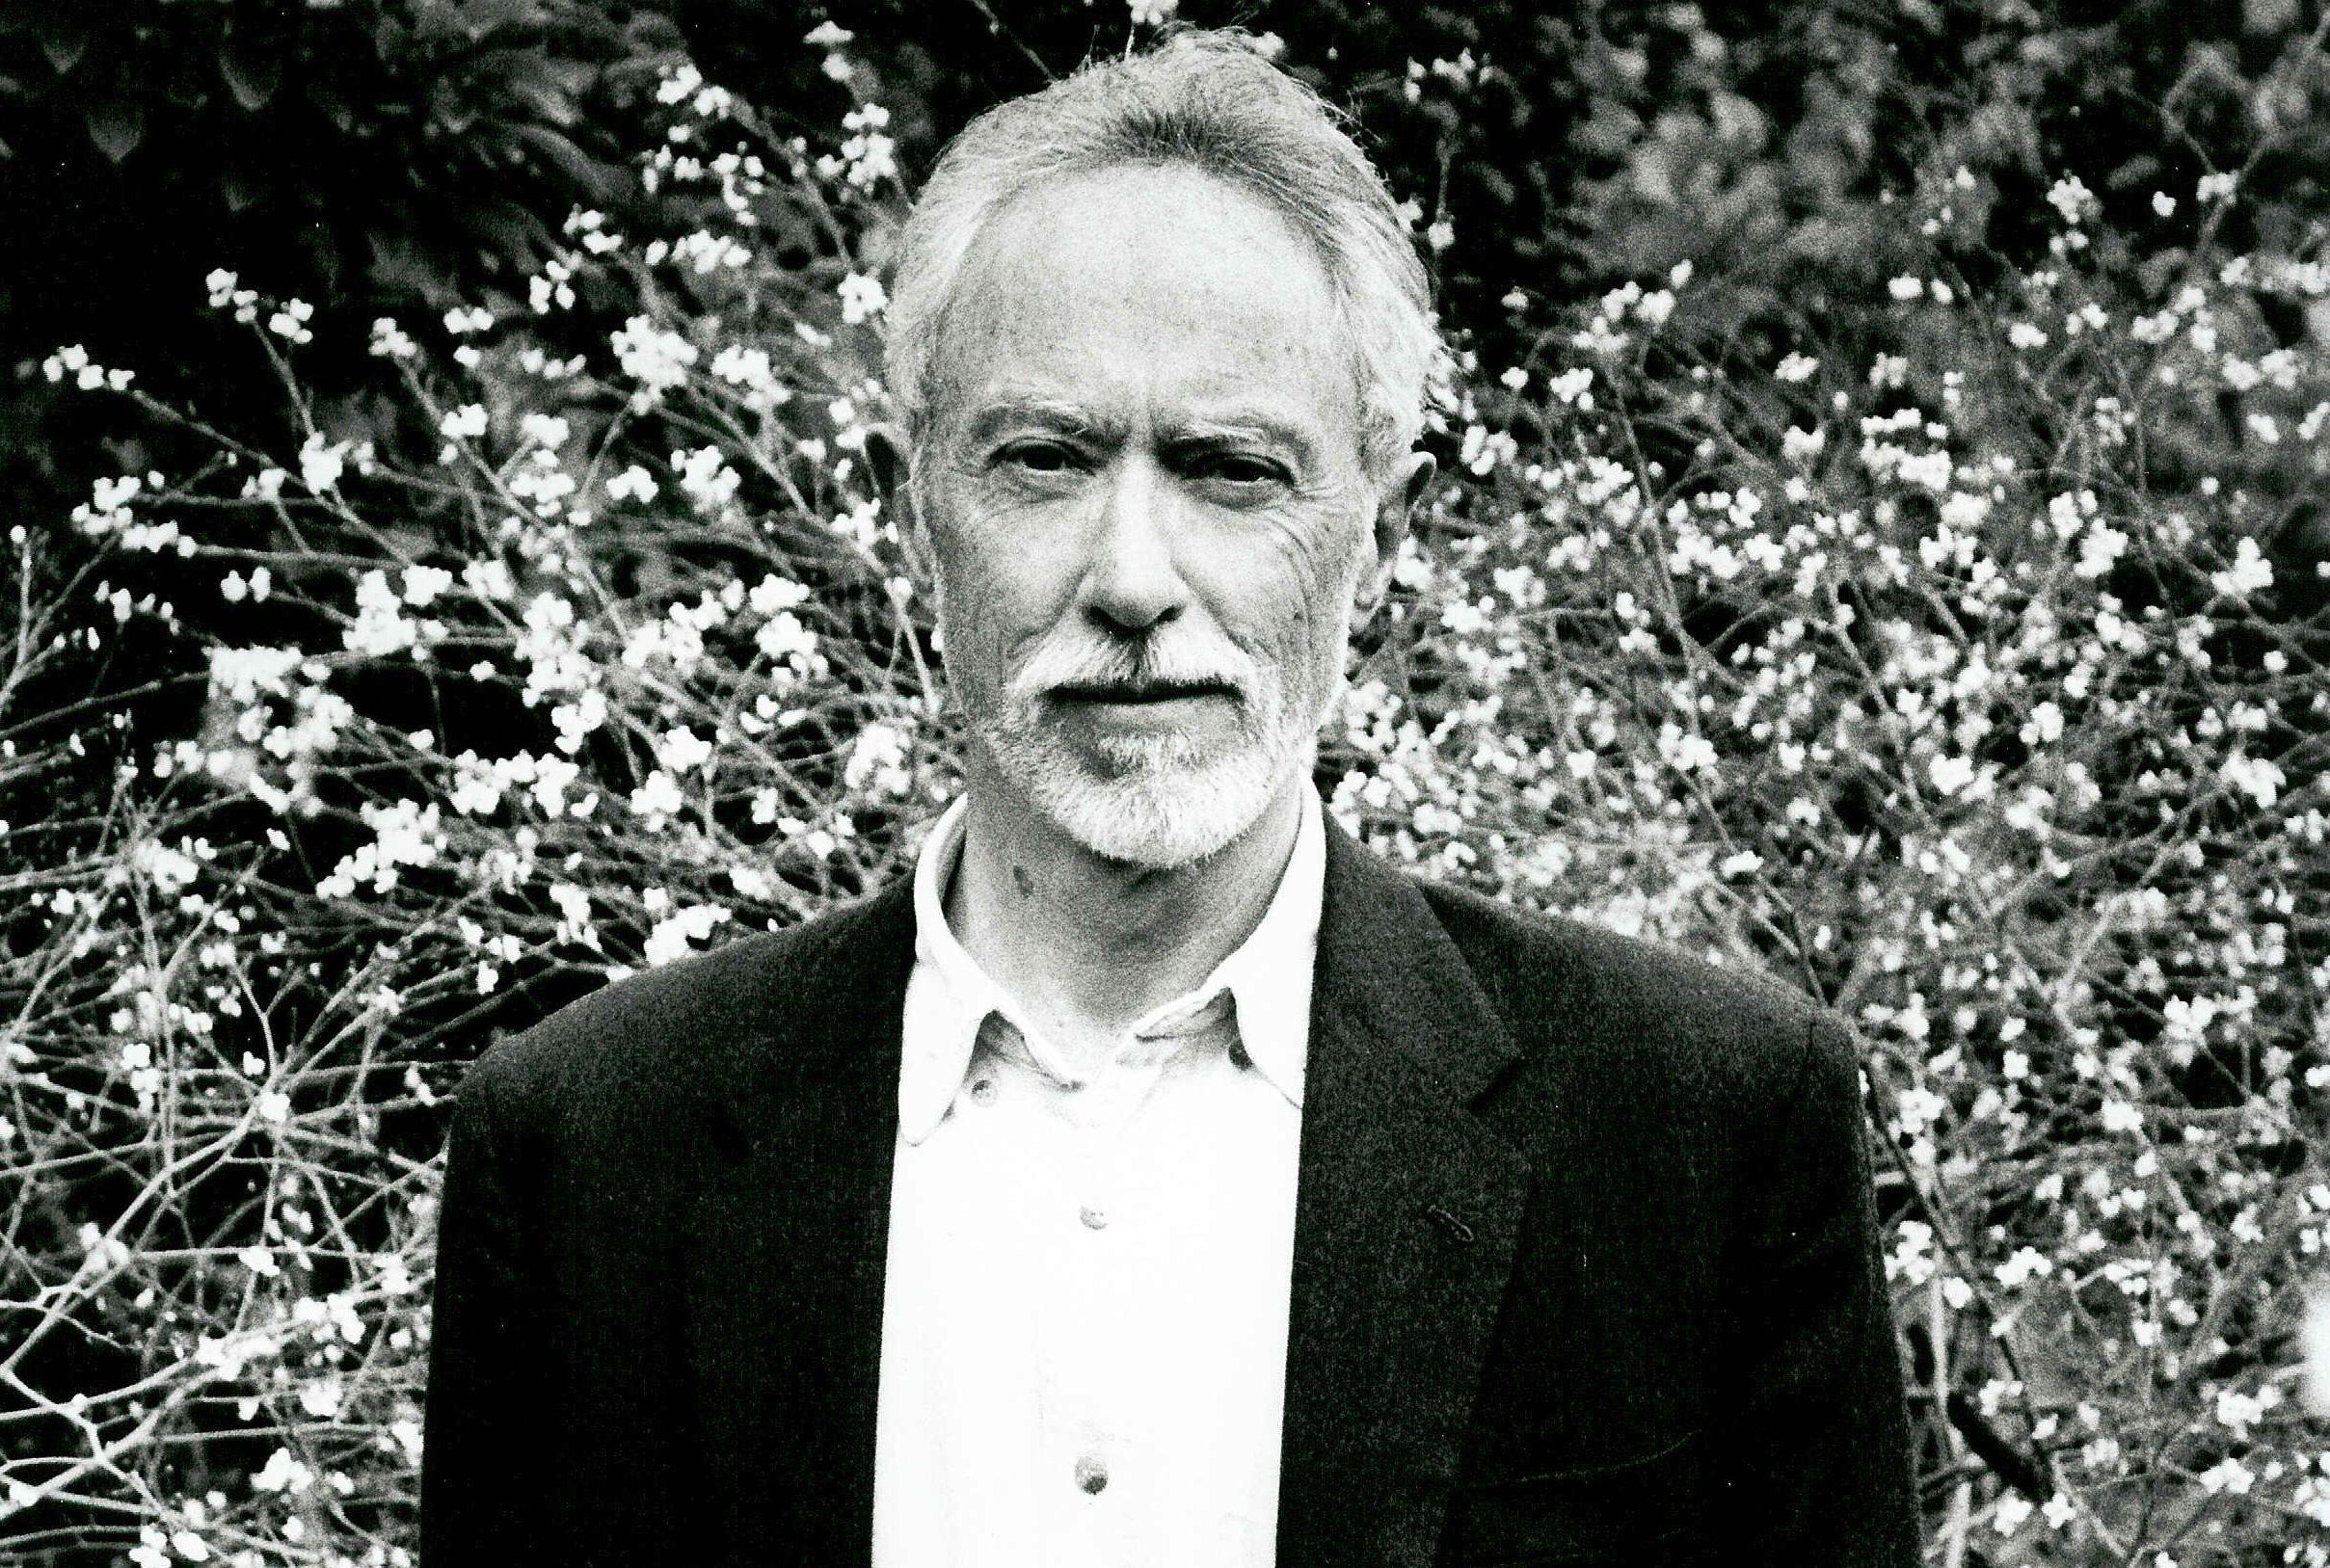 Man Booker Prize 2016 Longlist: J.M. Coetzee Leads Race for Literature Award